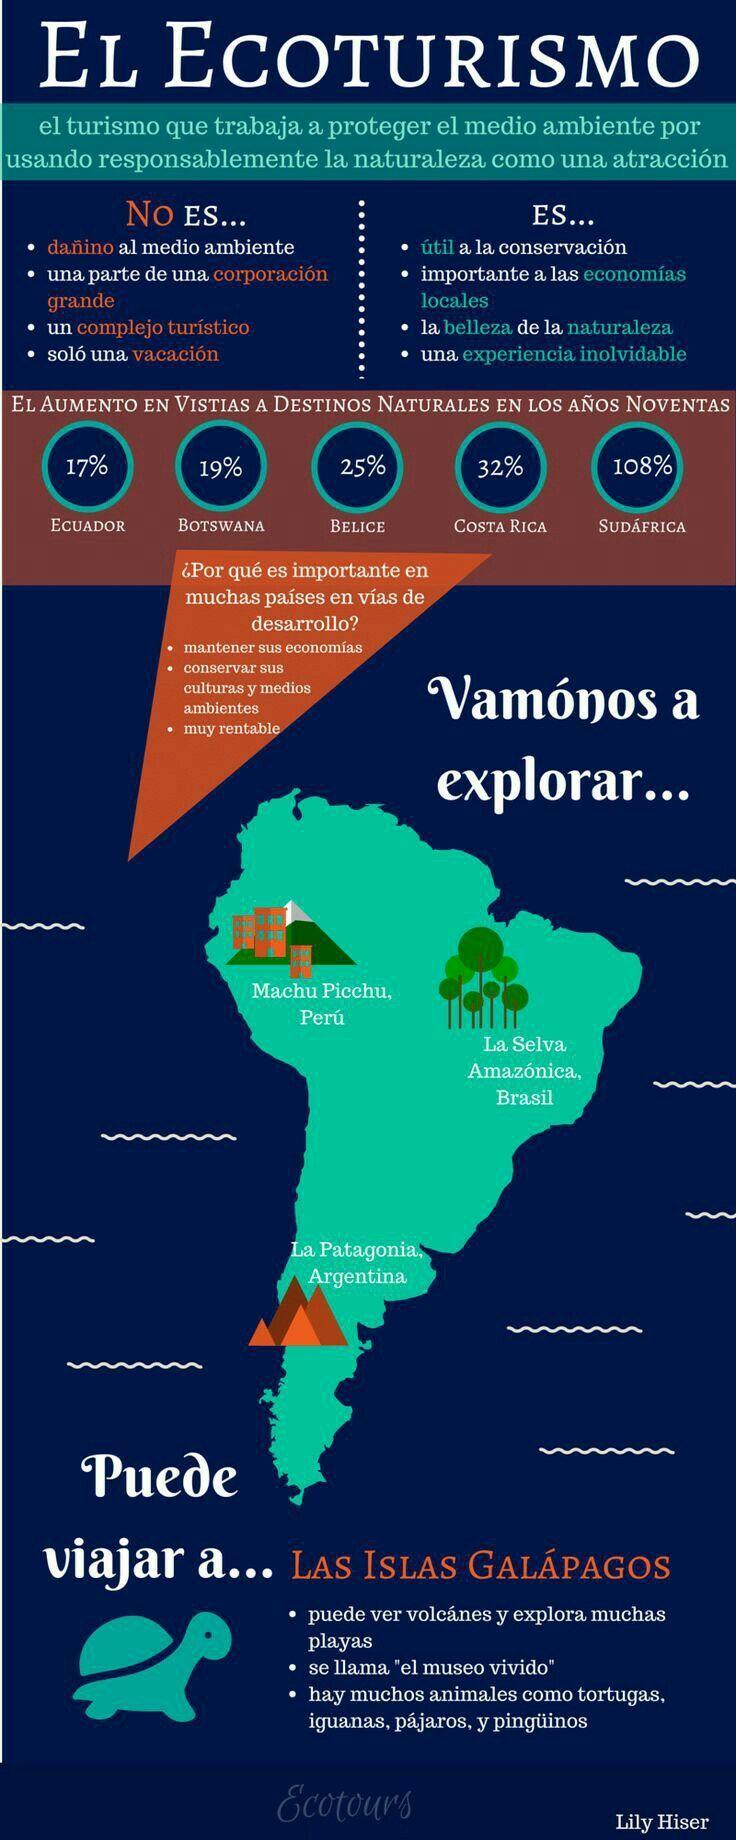 #Ecoturismo: un turismo responsable